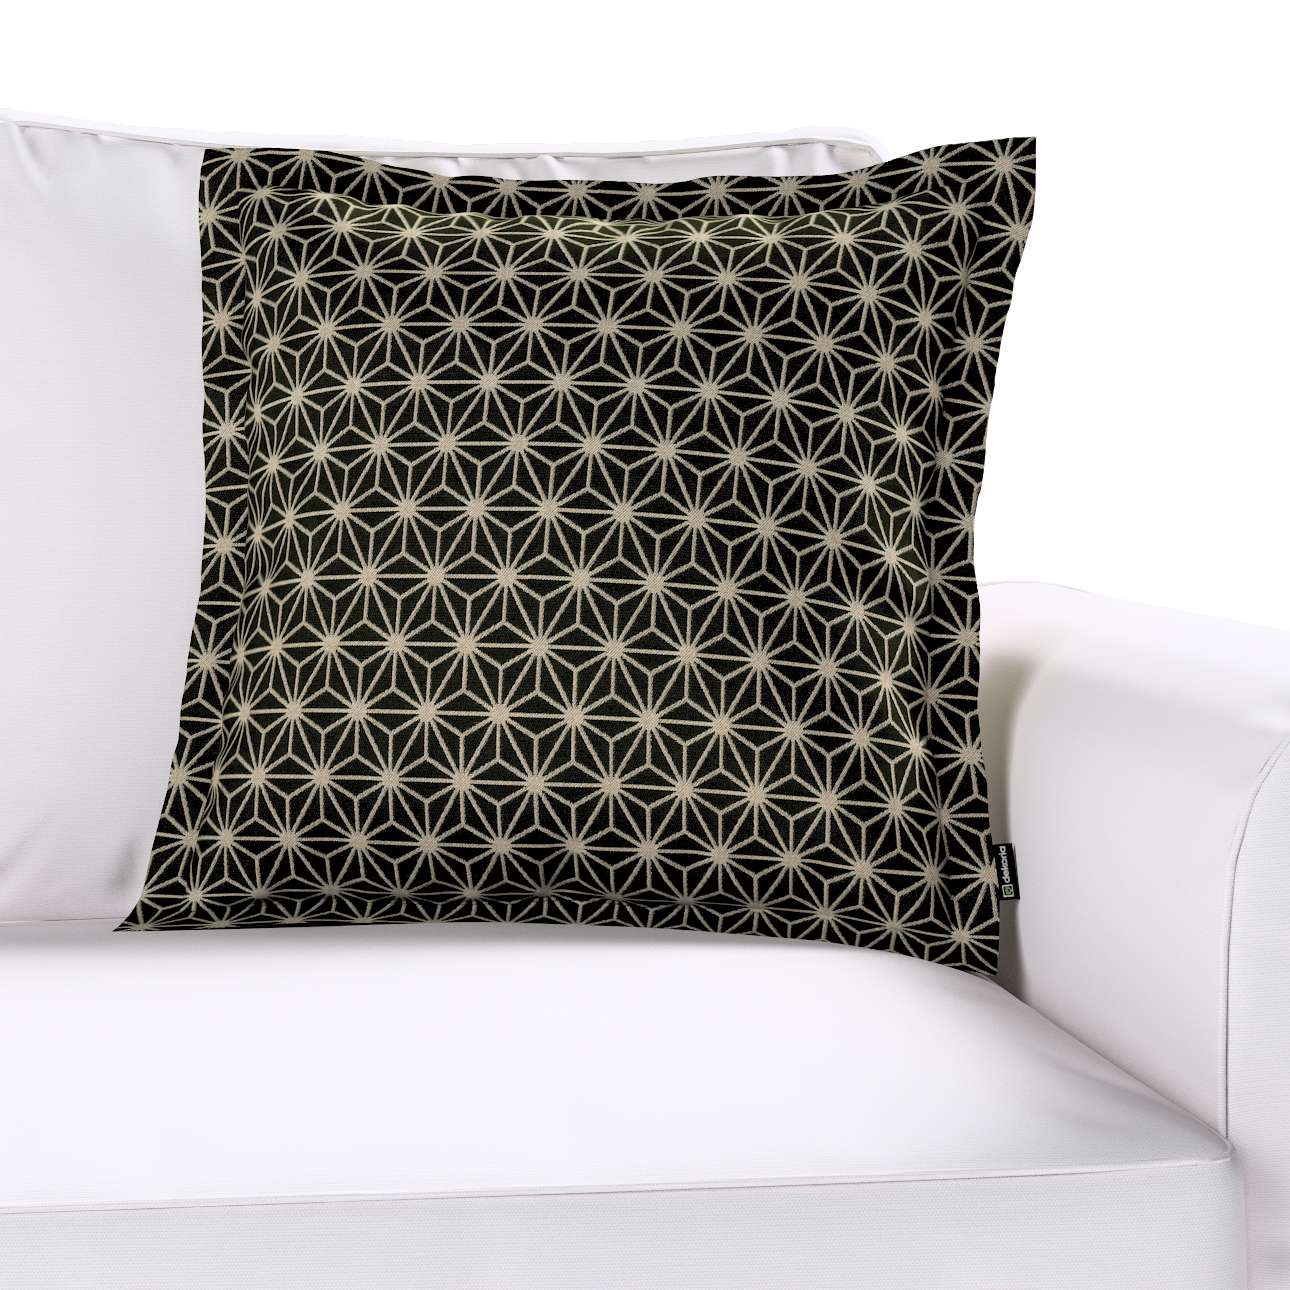 Mona - potah na polštář hladký lem po obvodu v kolekci Black & White, látka: 142-56